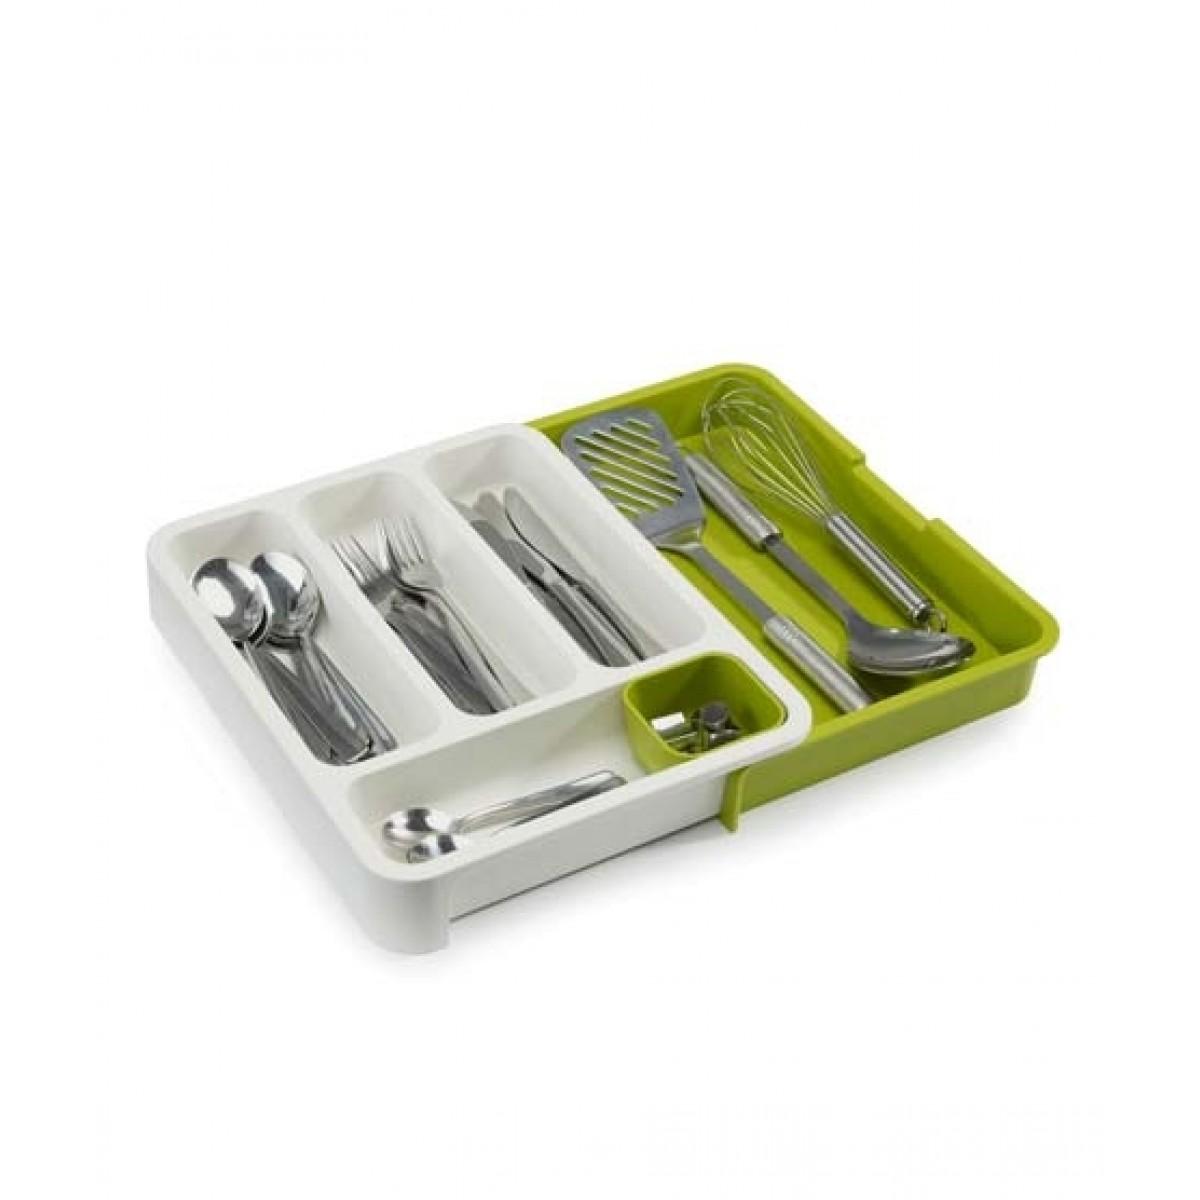 Muzamil Store Expandable Cutlery Tray